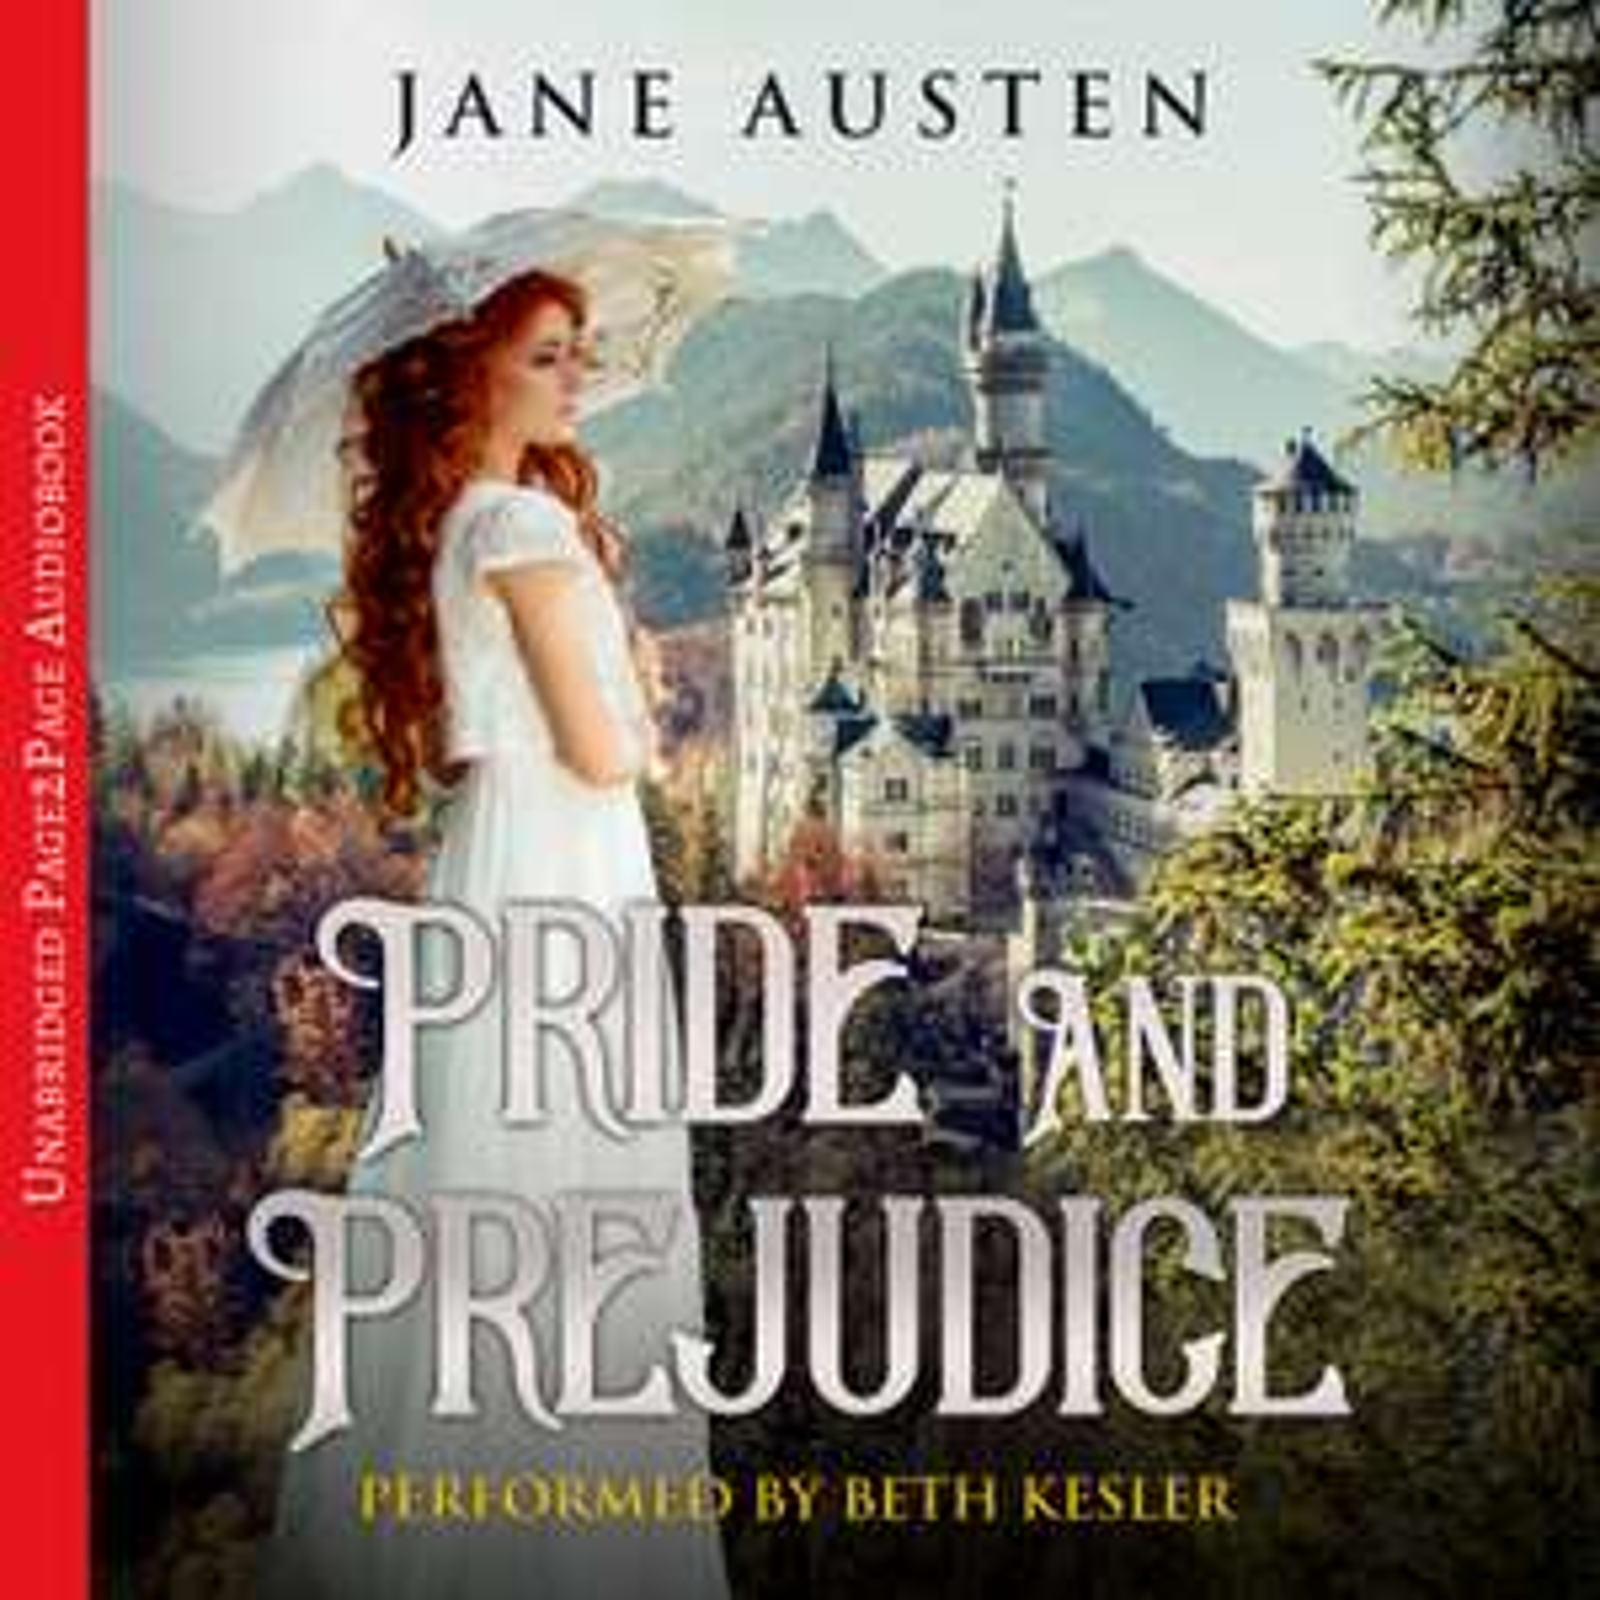 [Amazon-Audible] Pride and Prejudice Unabridged Audiobook Performed by Beth Kesler @ £0.78